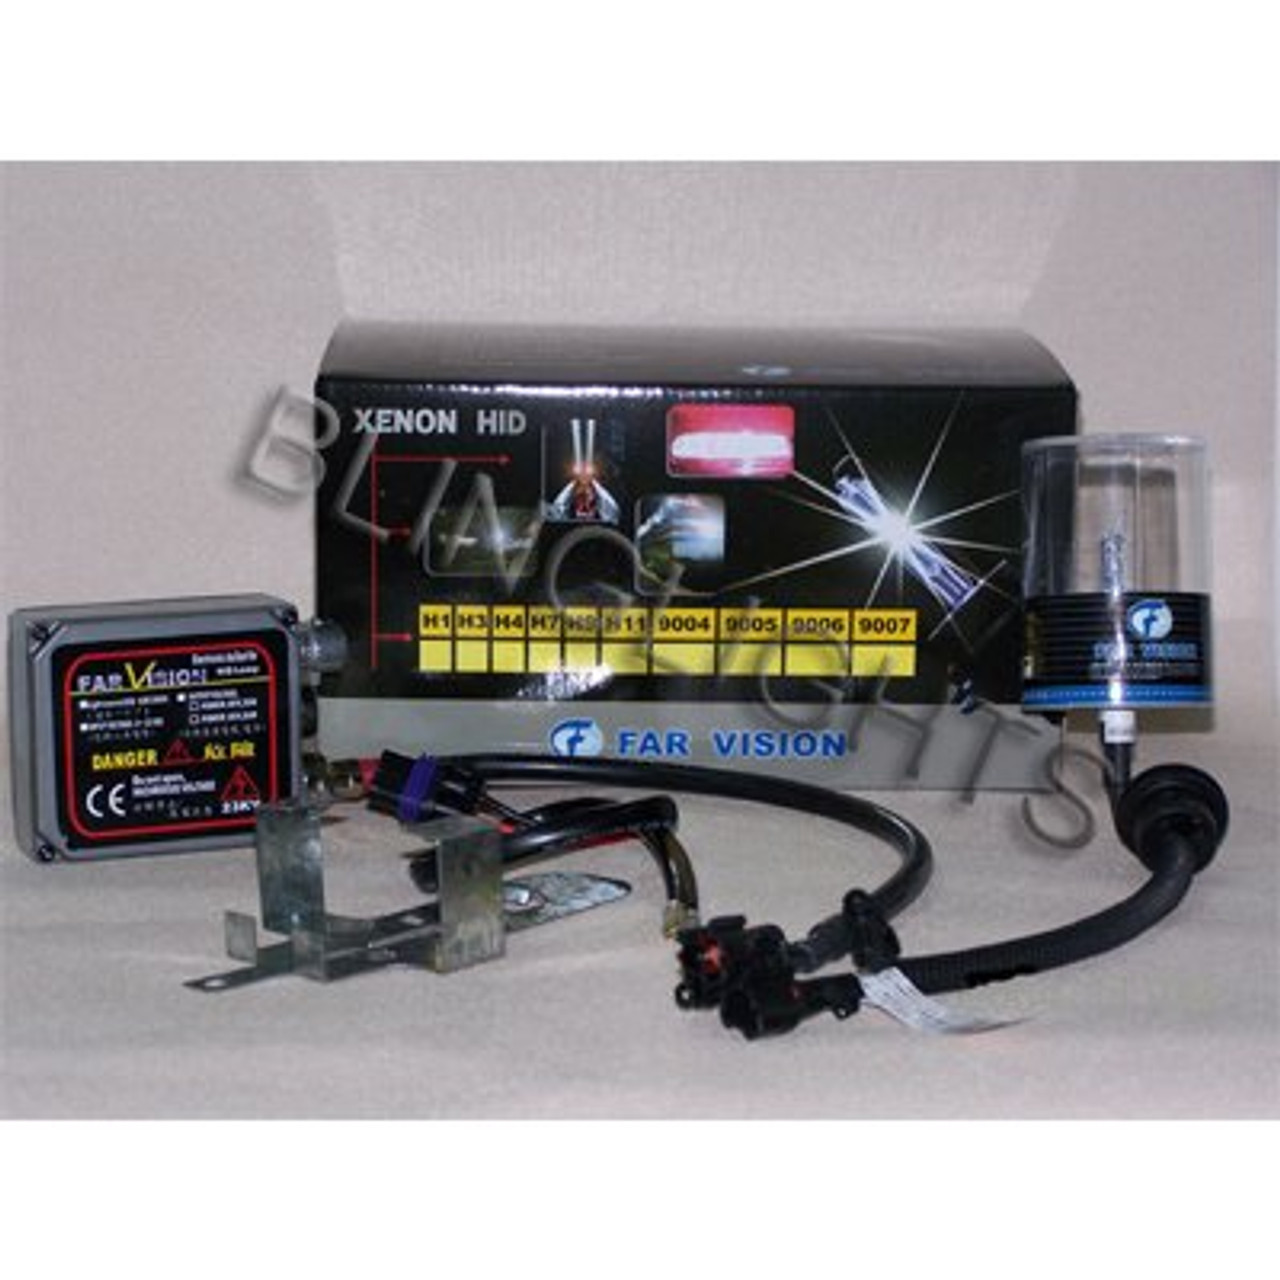 2000 2001 2002 Toyota Tundra Xenon HID Conversion Kit for Headlamps Headlights Head Lamps Lights